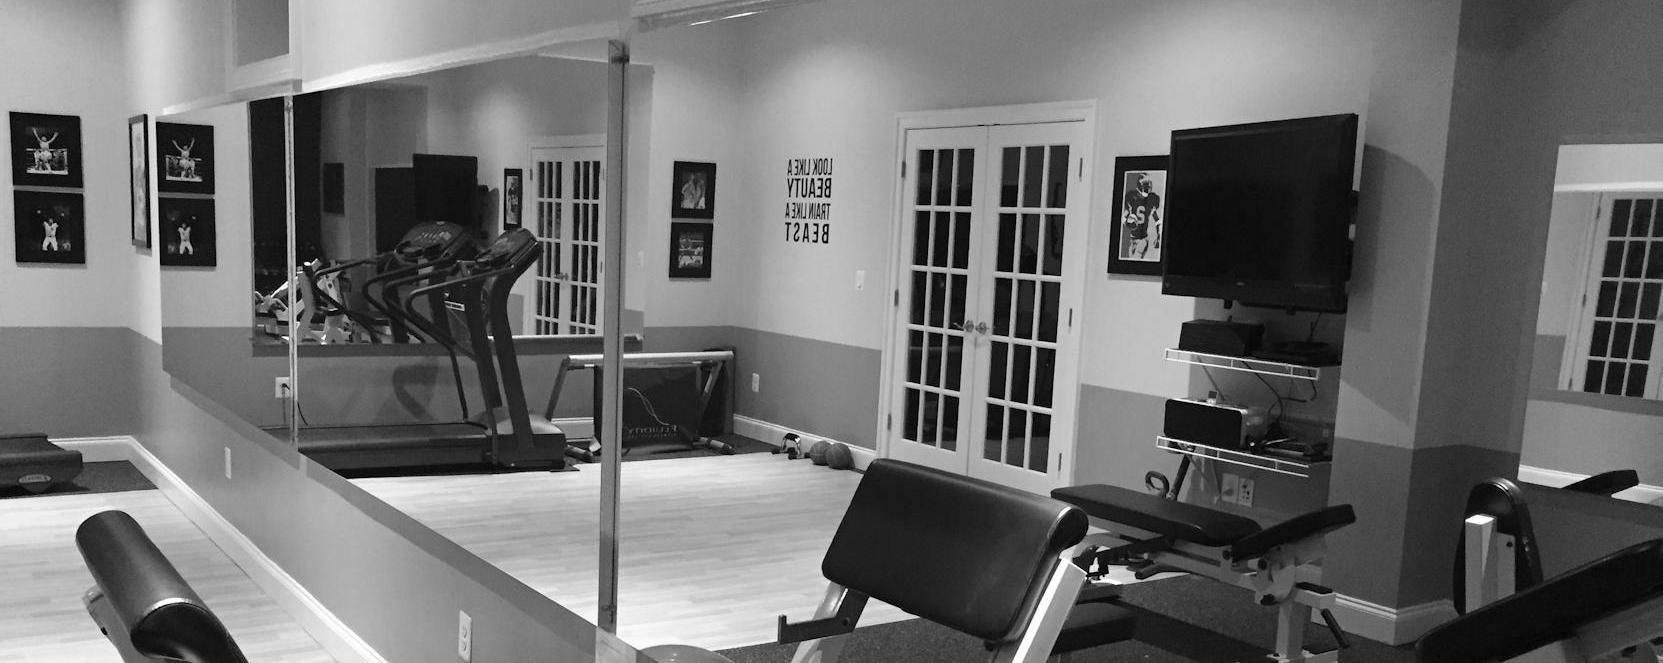 Glassless Gym Mirrors